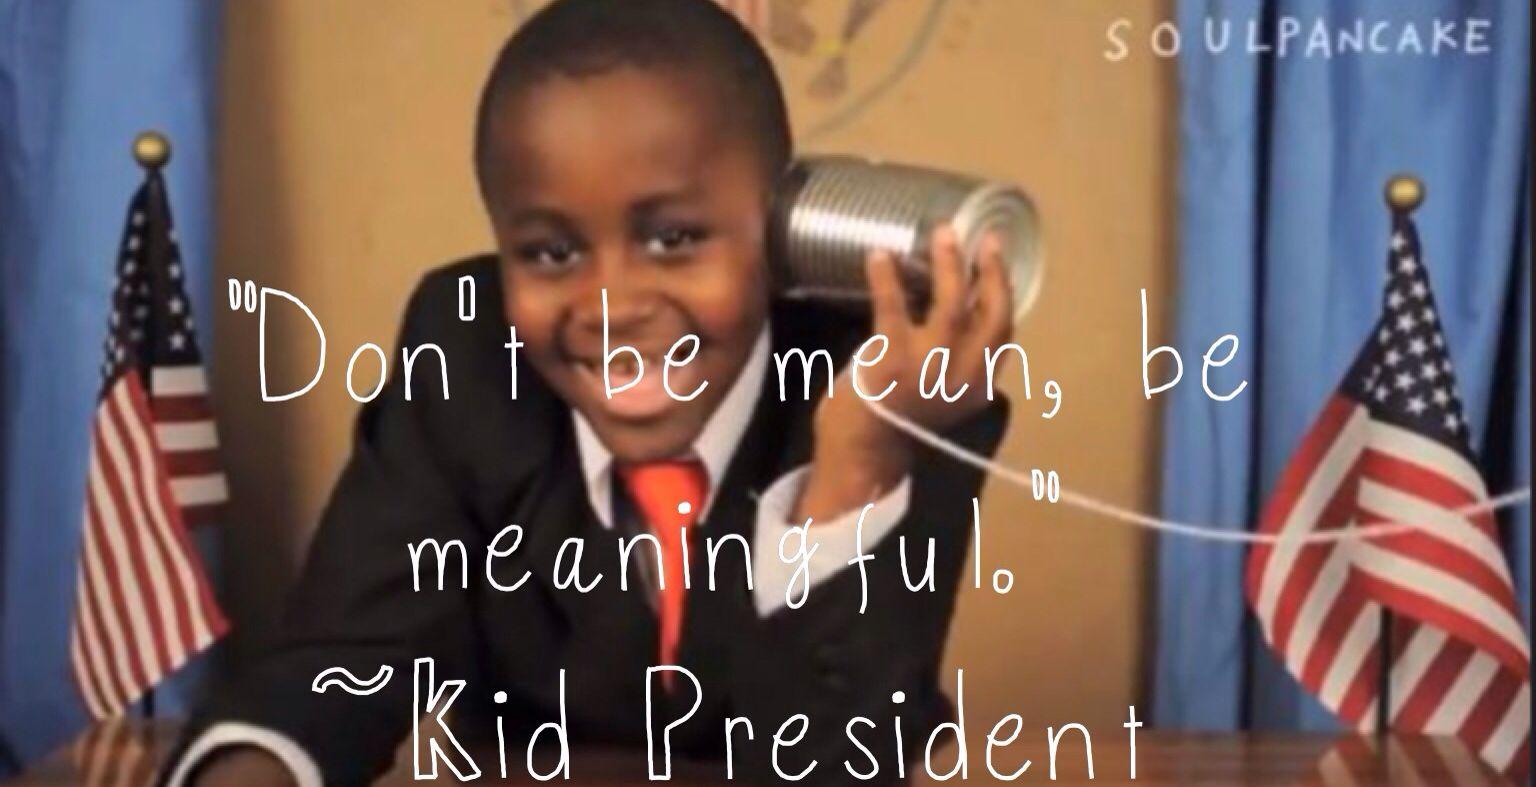 Kid President Quote | Quotes | Pinterest | Kid president quotes ...